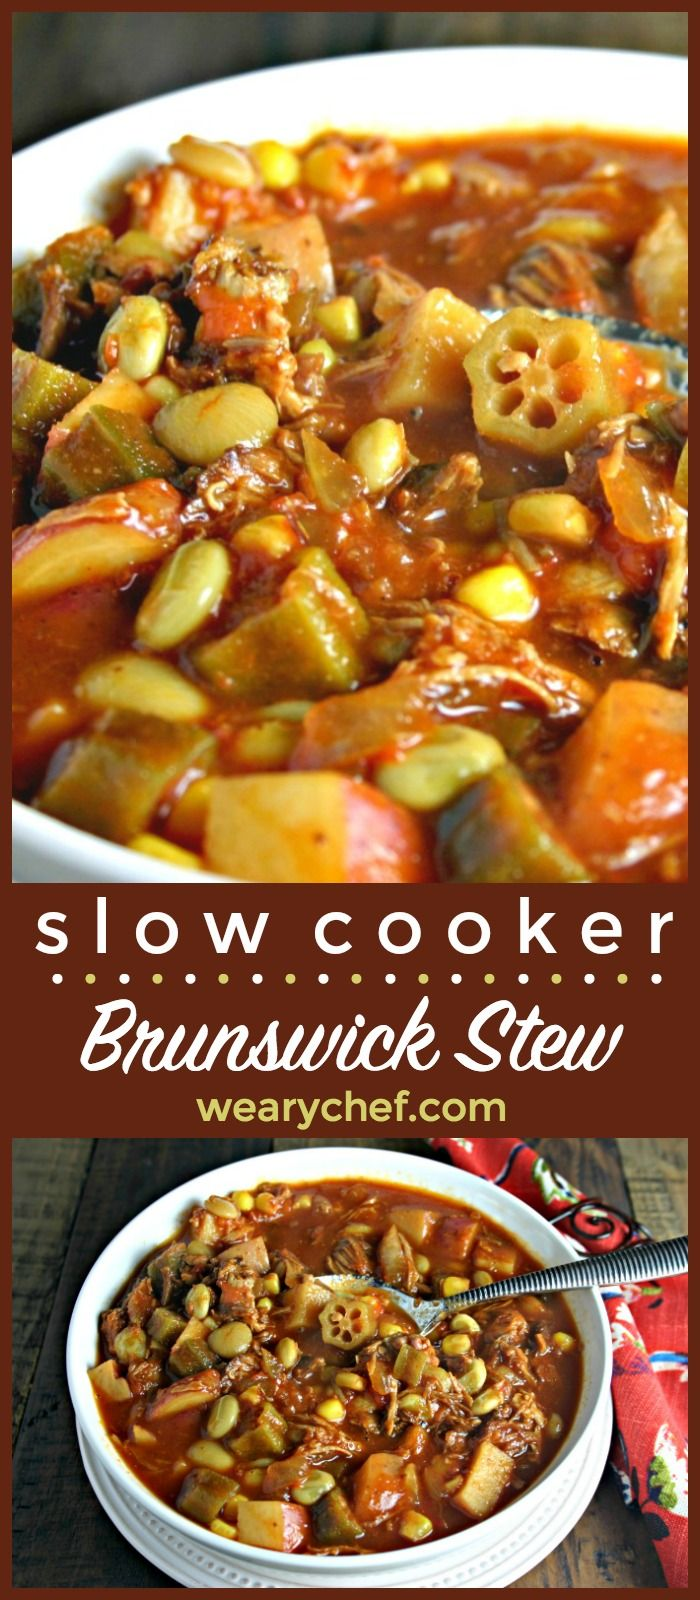 Easy Brunswick Stew in the Slow Cooker – Dan330